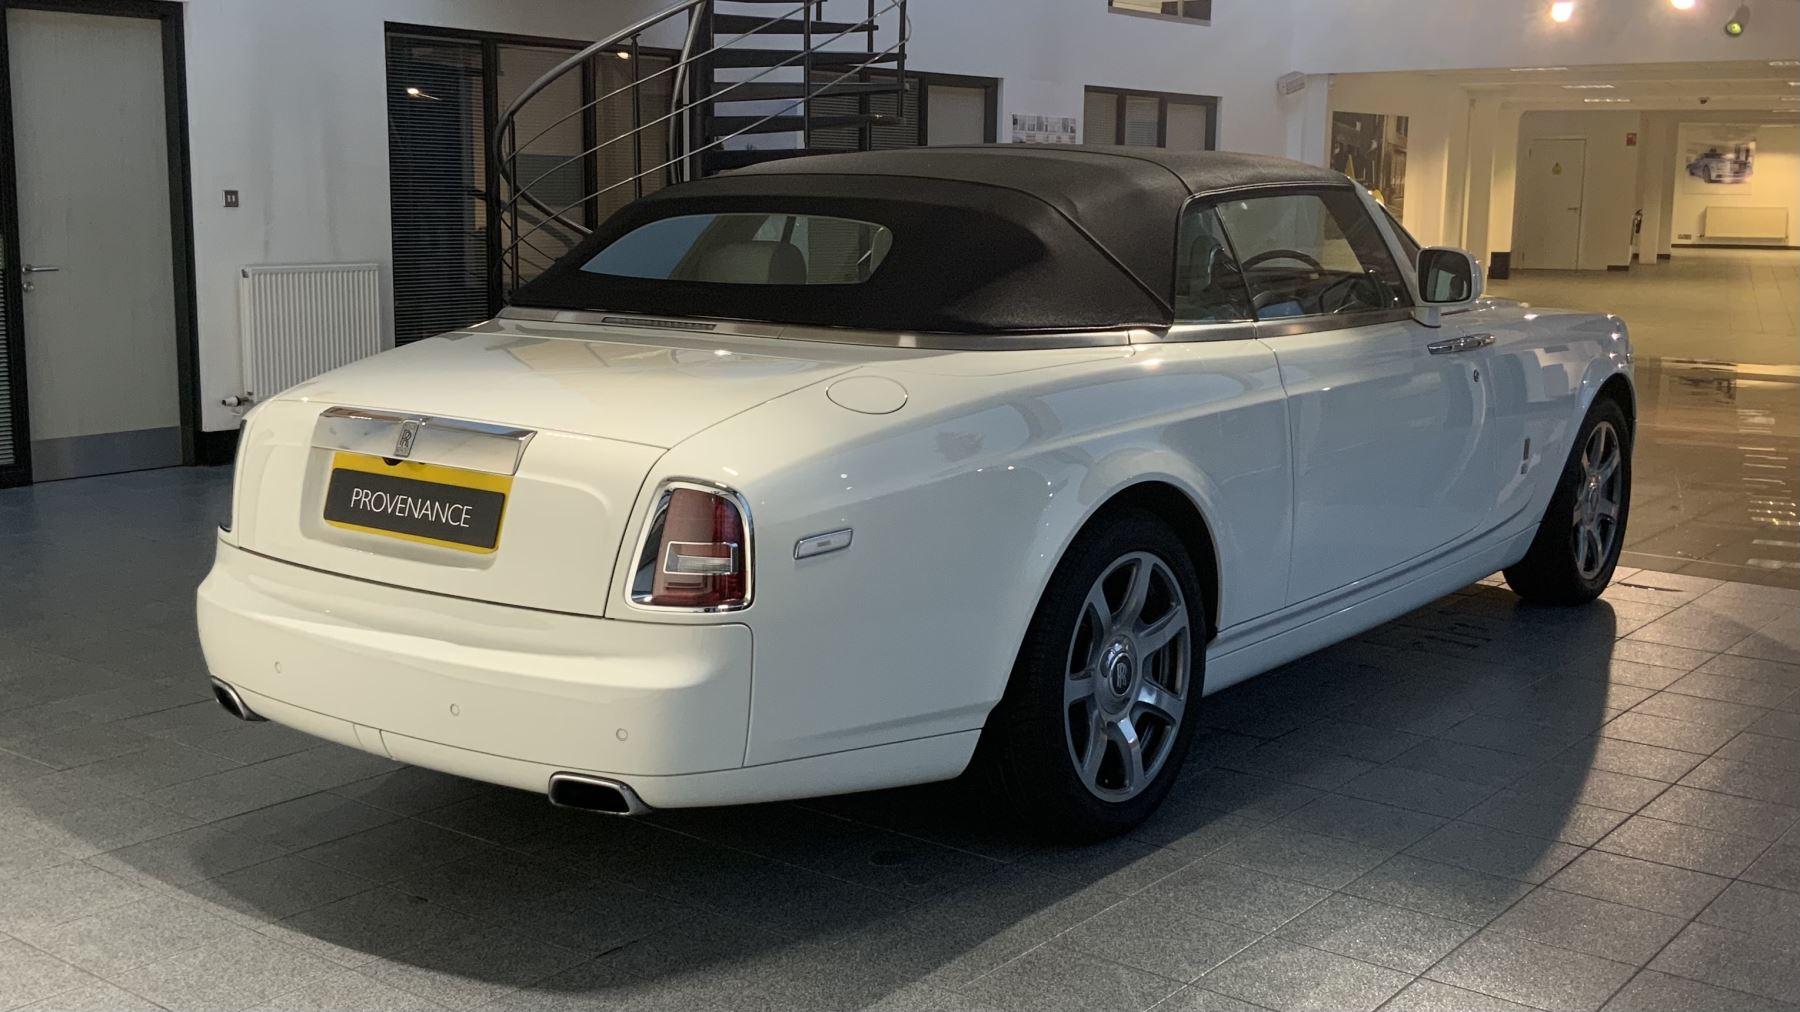 Rolls-Royce Phantom Drophead Coupe Series 2 image 11